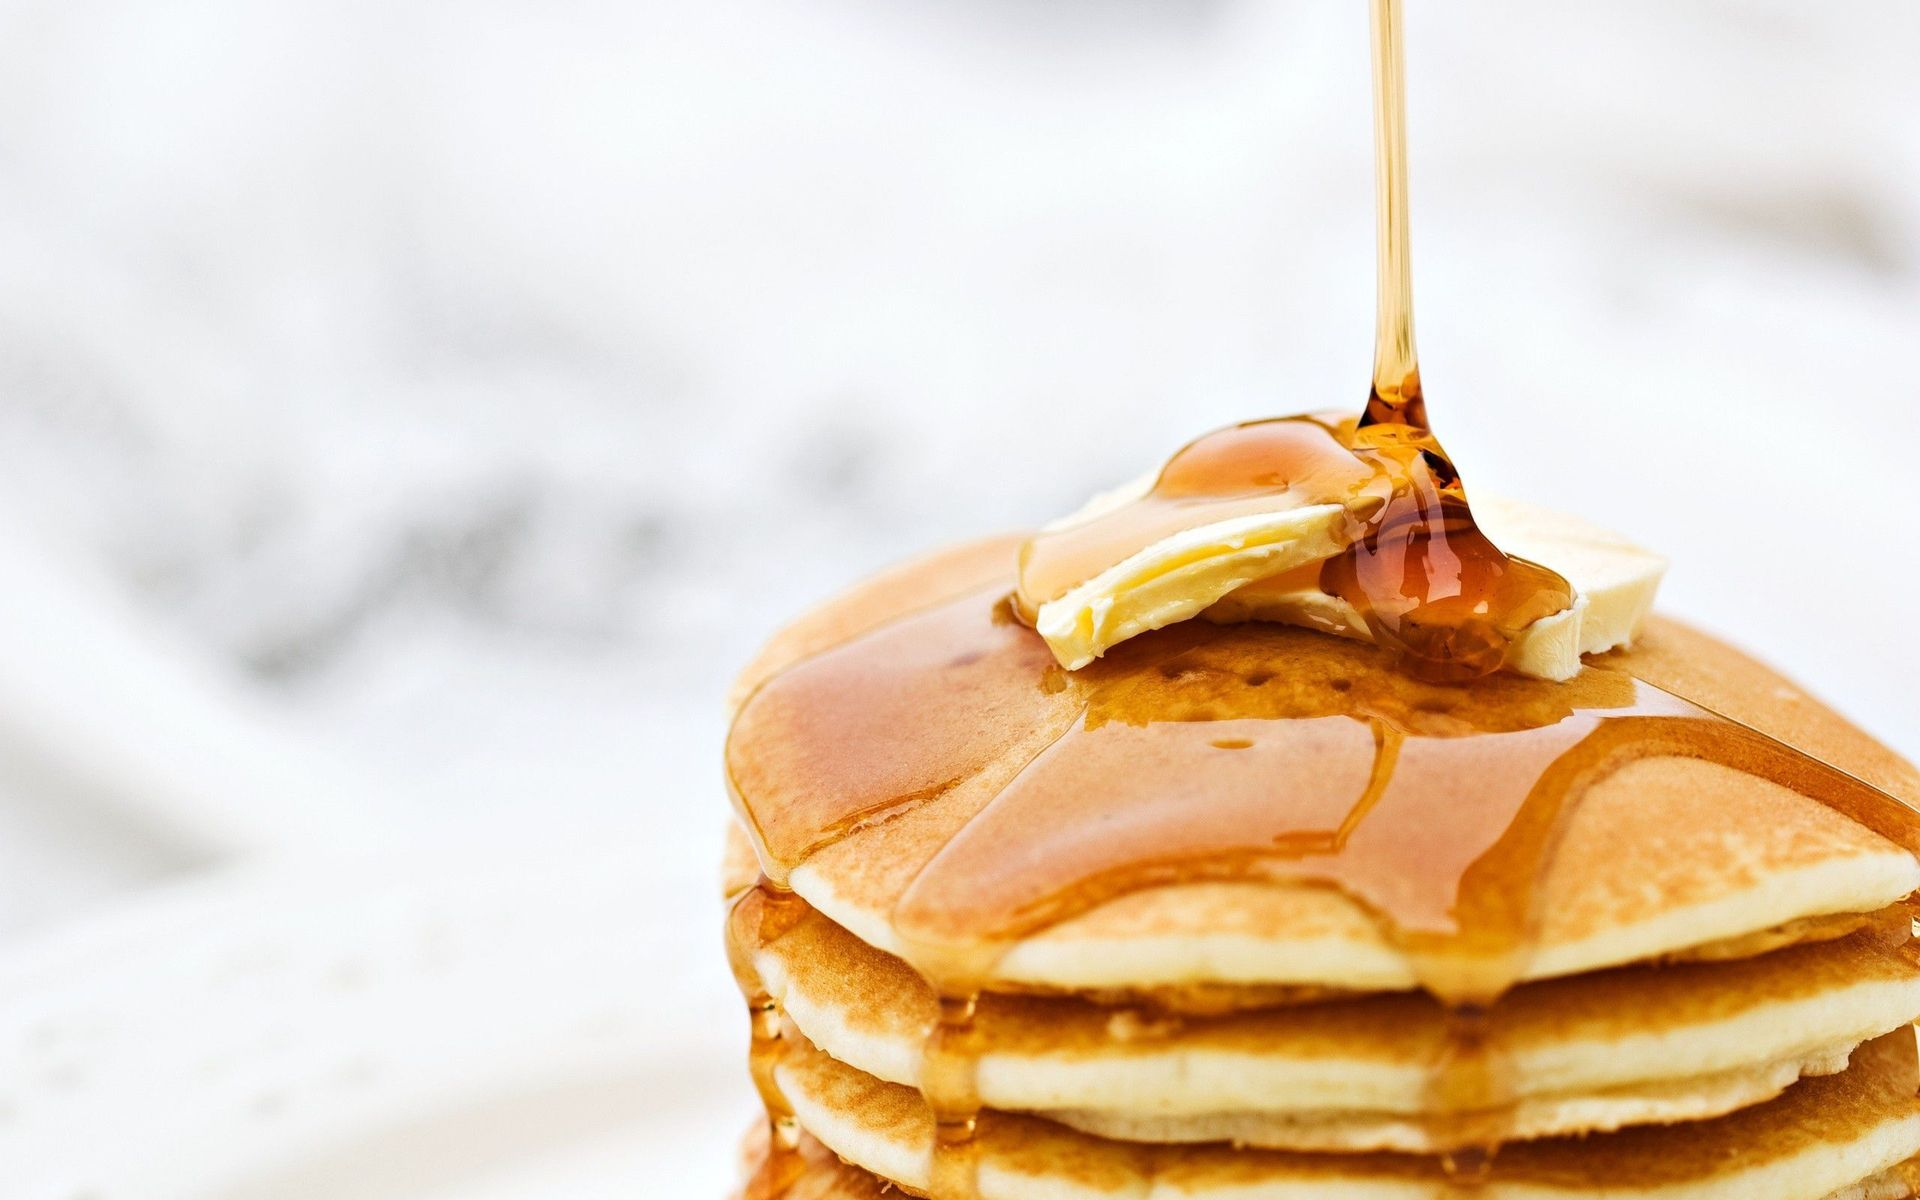 Pancakes Wallpapers 1920x1200 px 34U61R9 WallpapersExpertcom 1920x1200